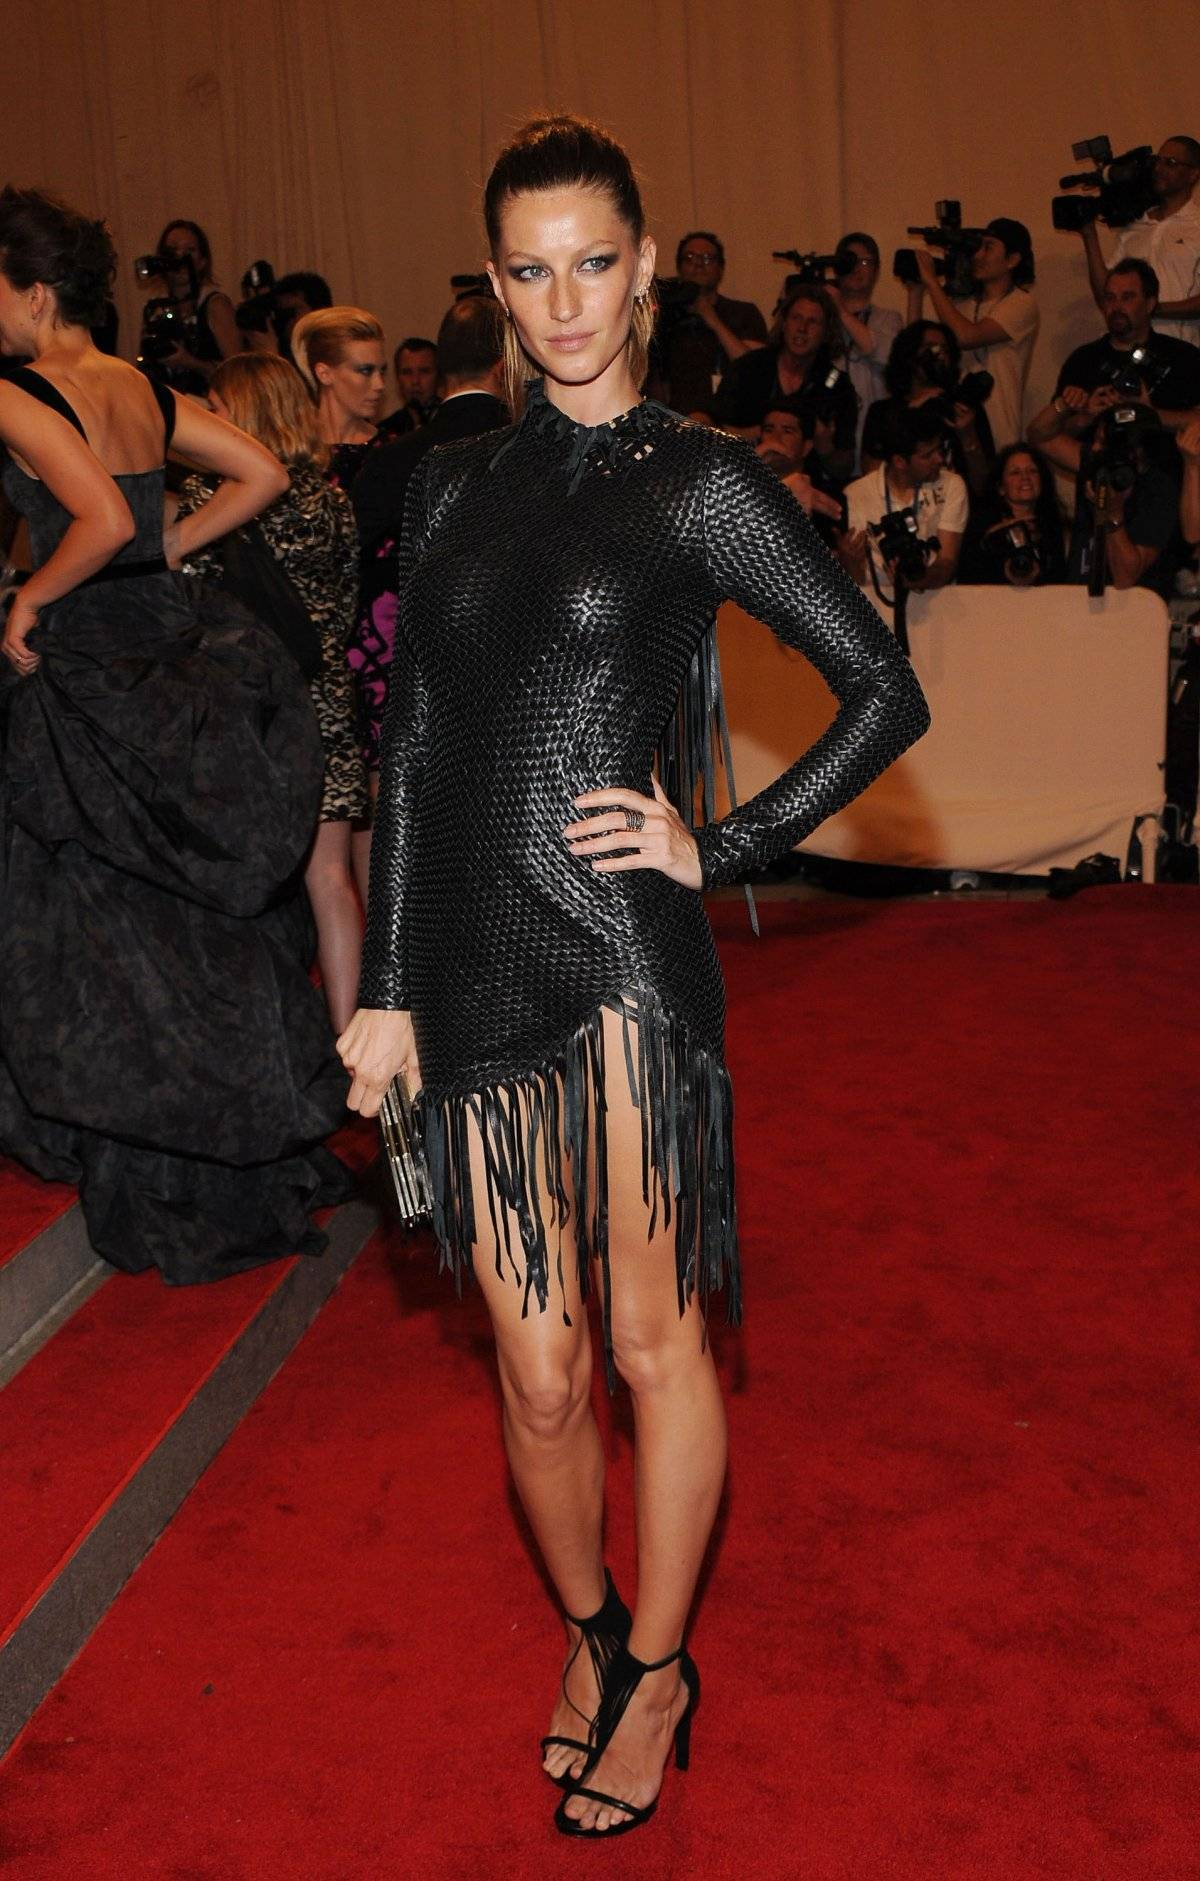 Gisele Bünchen met gala 2010